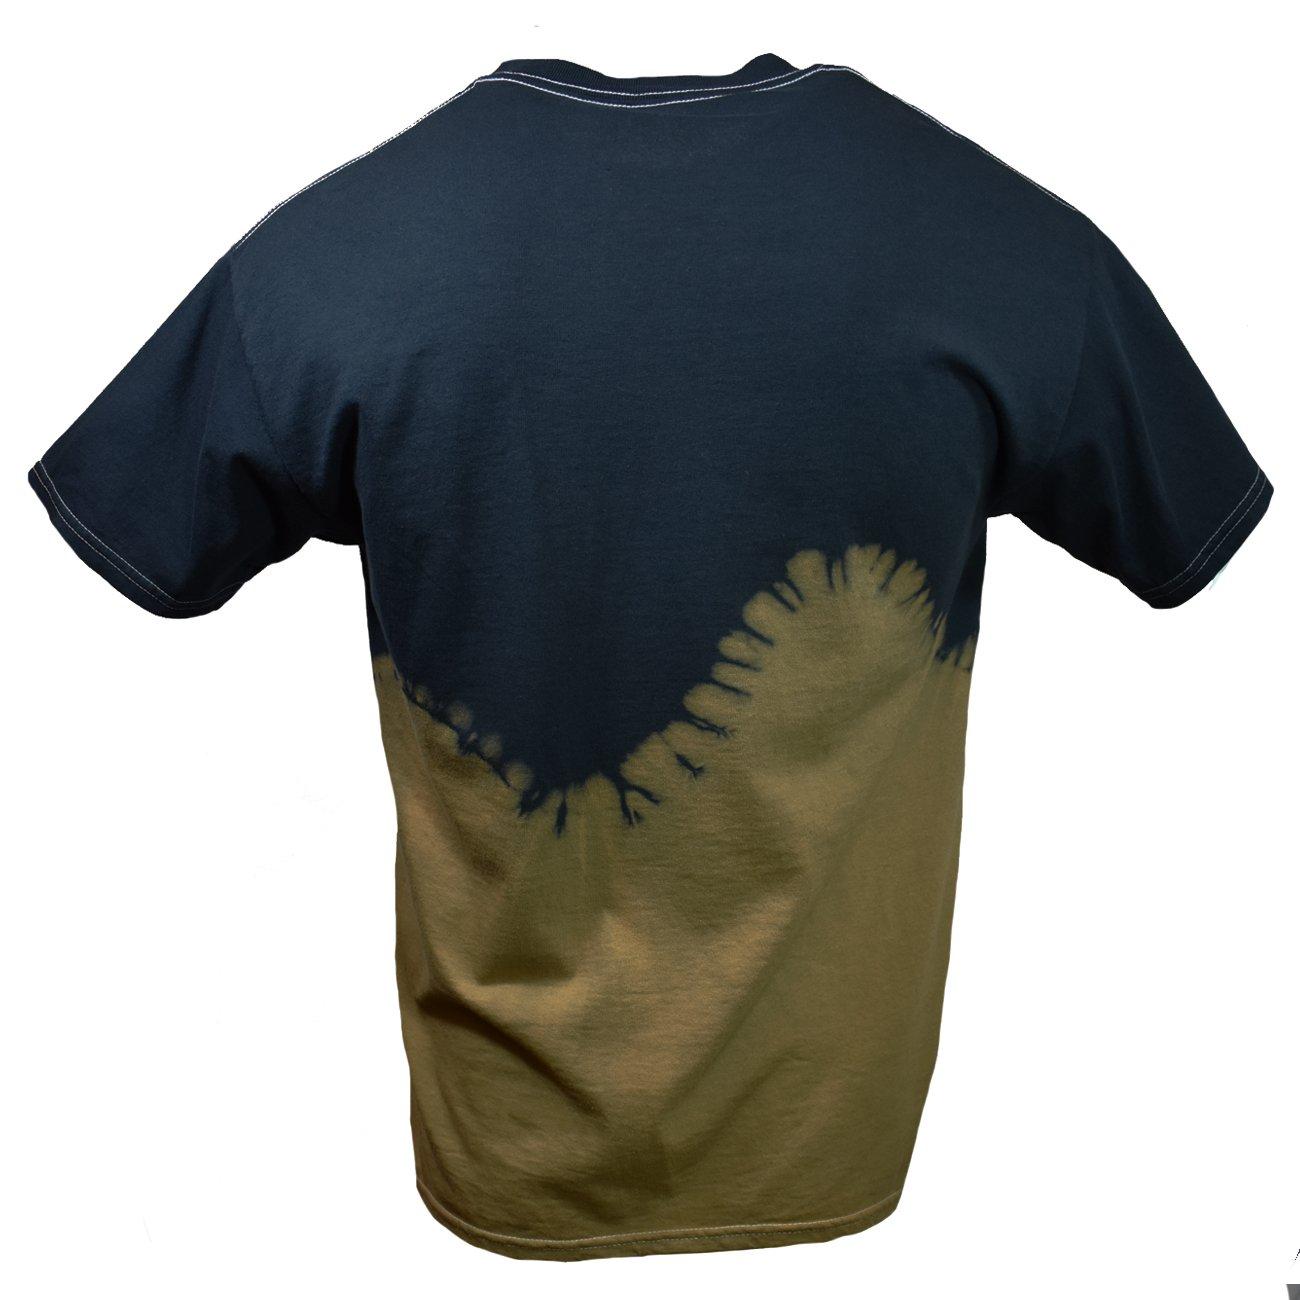 030049d7ef2fe Amazon.com: Def Leppard Men's T-Shirt, Tie Dye Official Tee, Hysteria Album  Black: Clothing